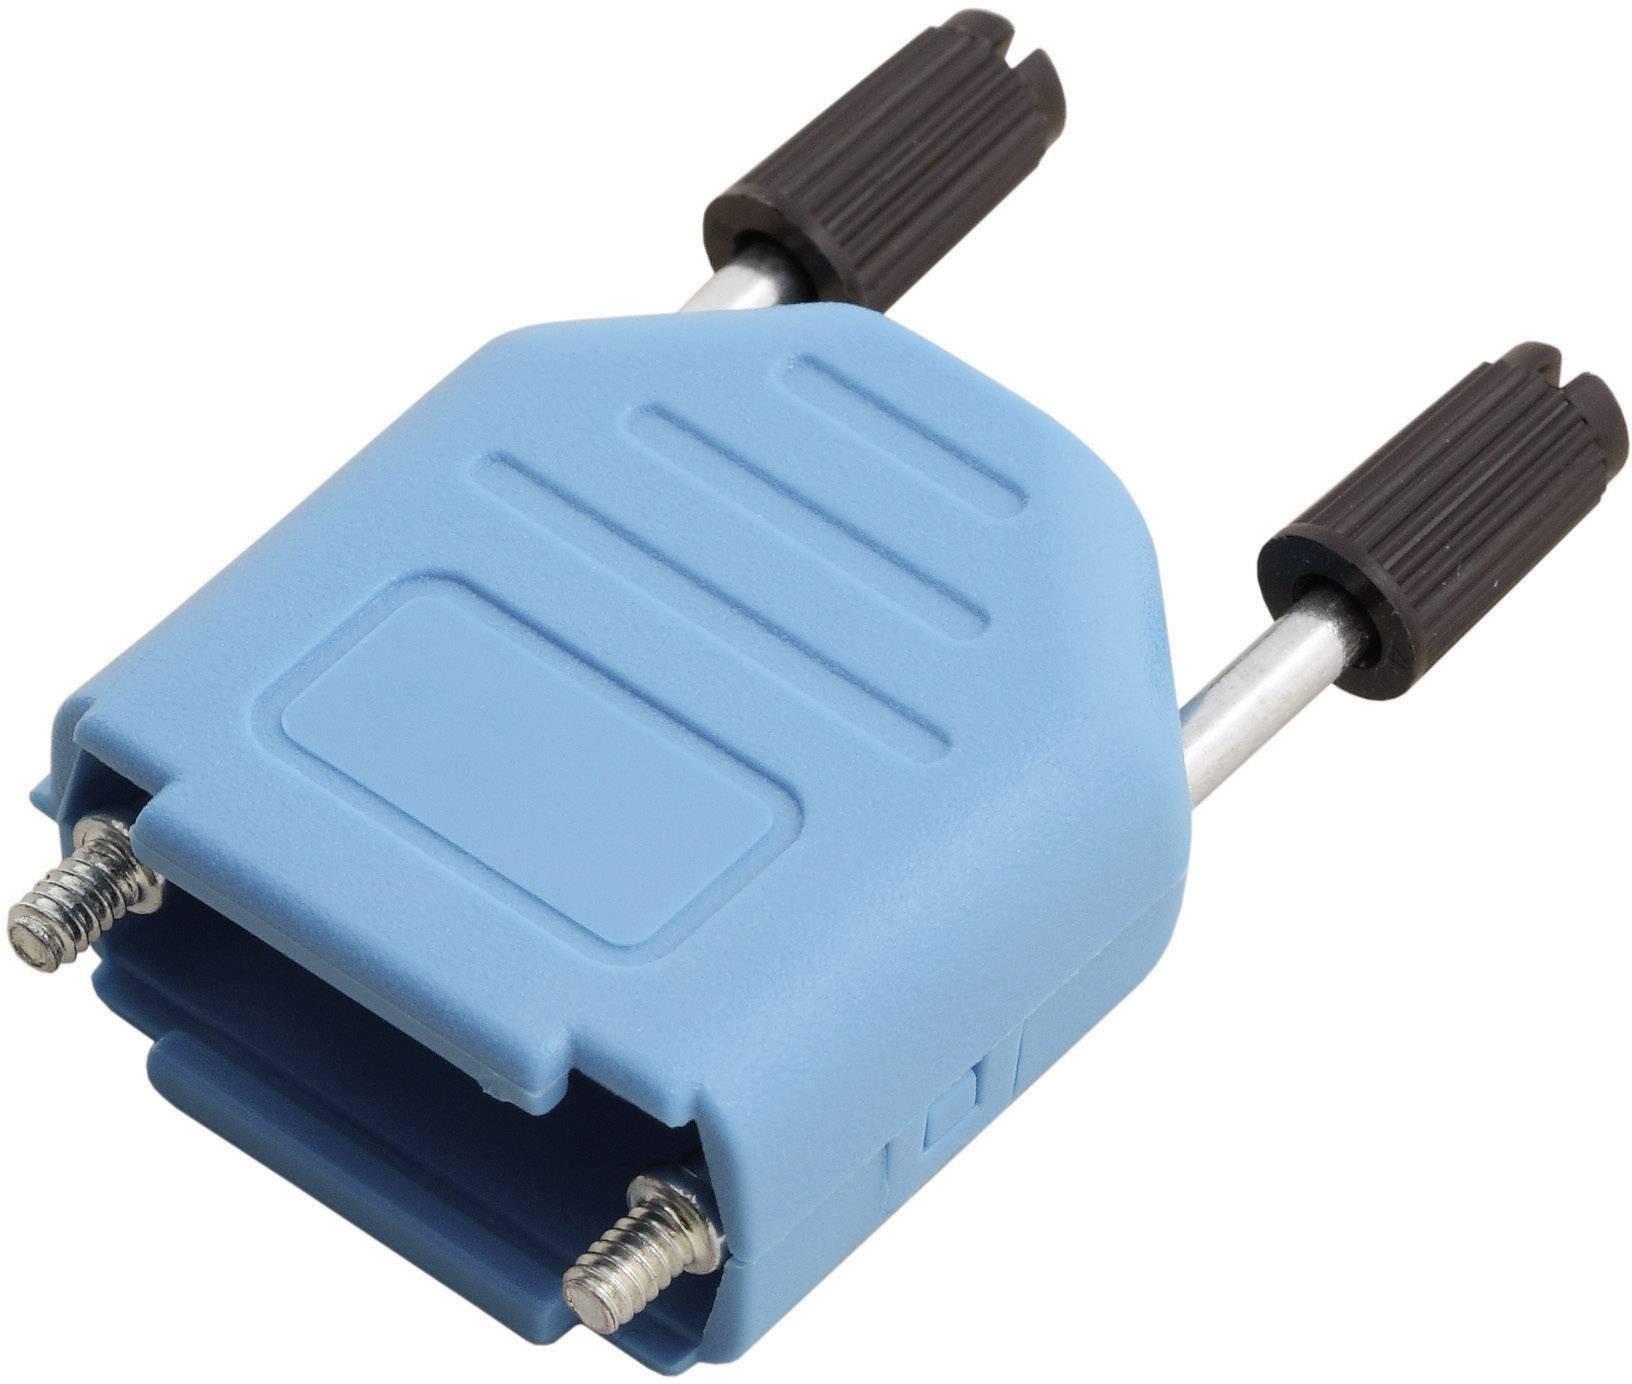 D-SUB pouzdro MH Connectors MHDPPK15-B-K, Pólů: 15, plast, 180 °, modrá, 1 ks